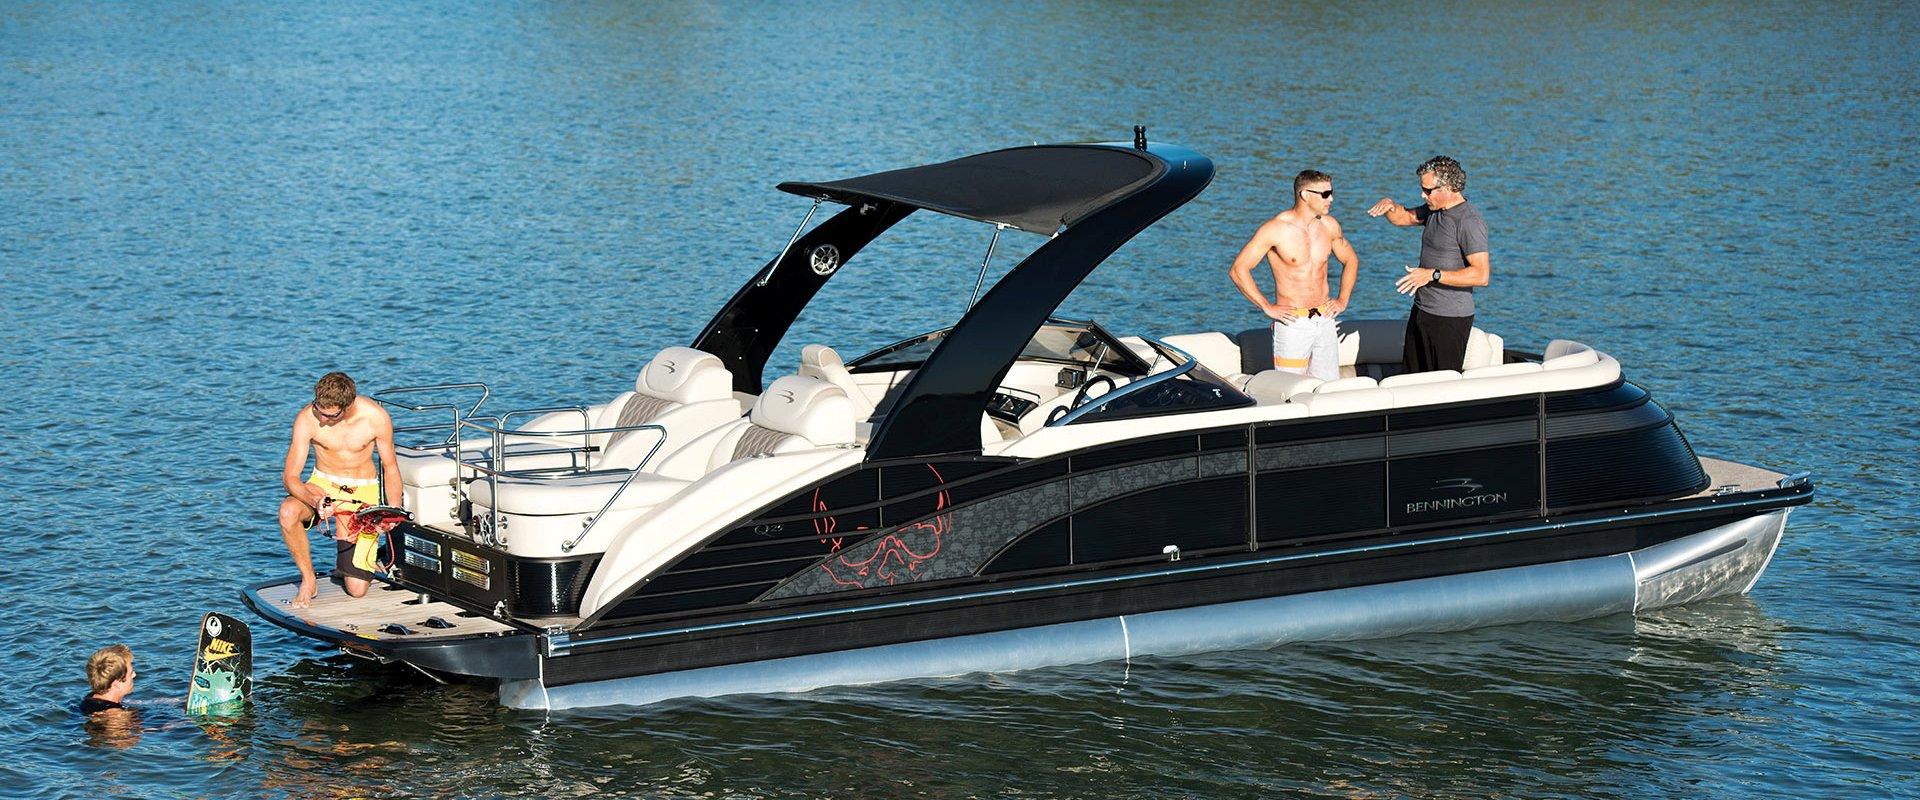 Celebrity boats parts